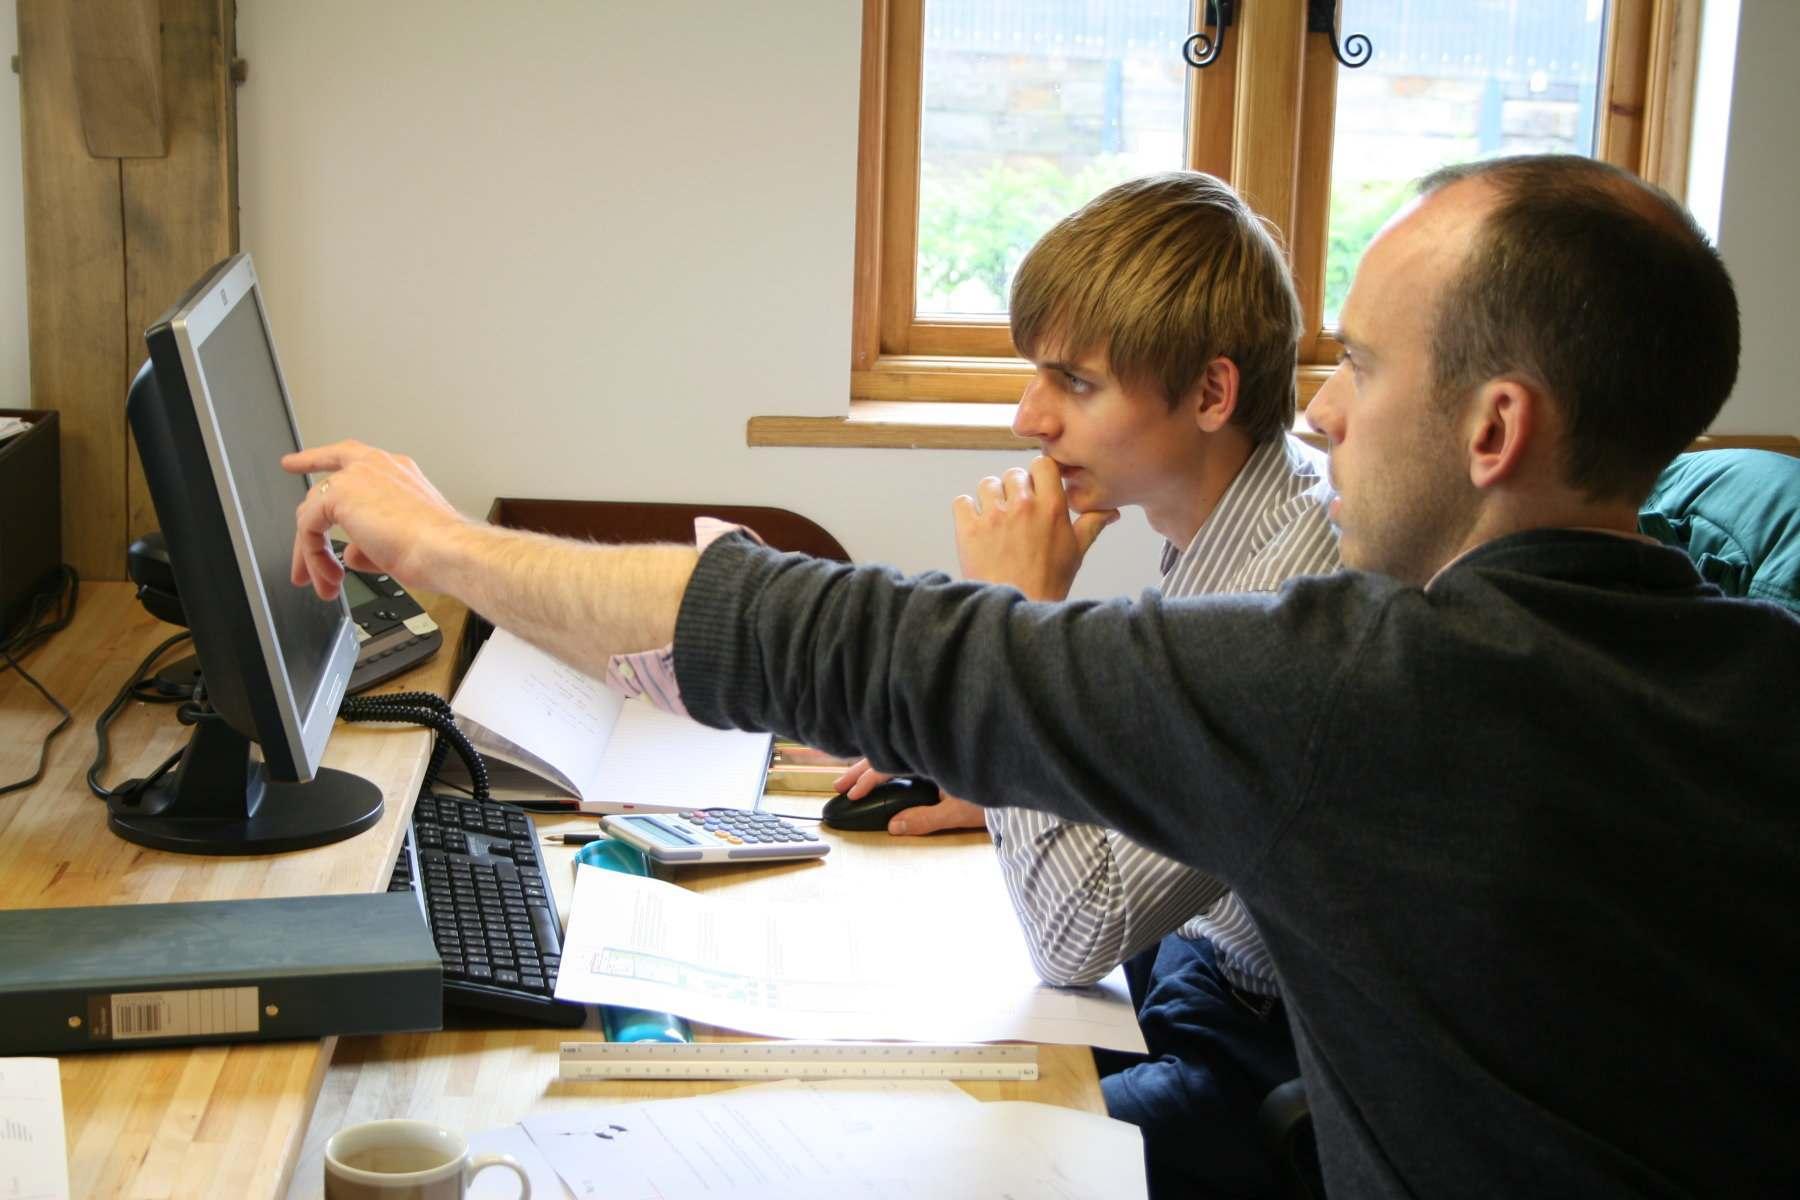 CAD_consultation_designers_technician_workstation